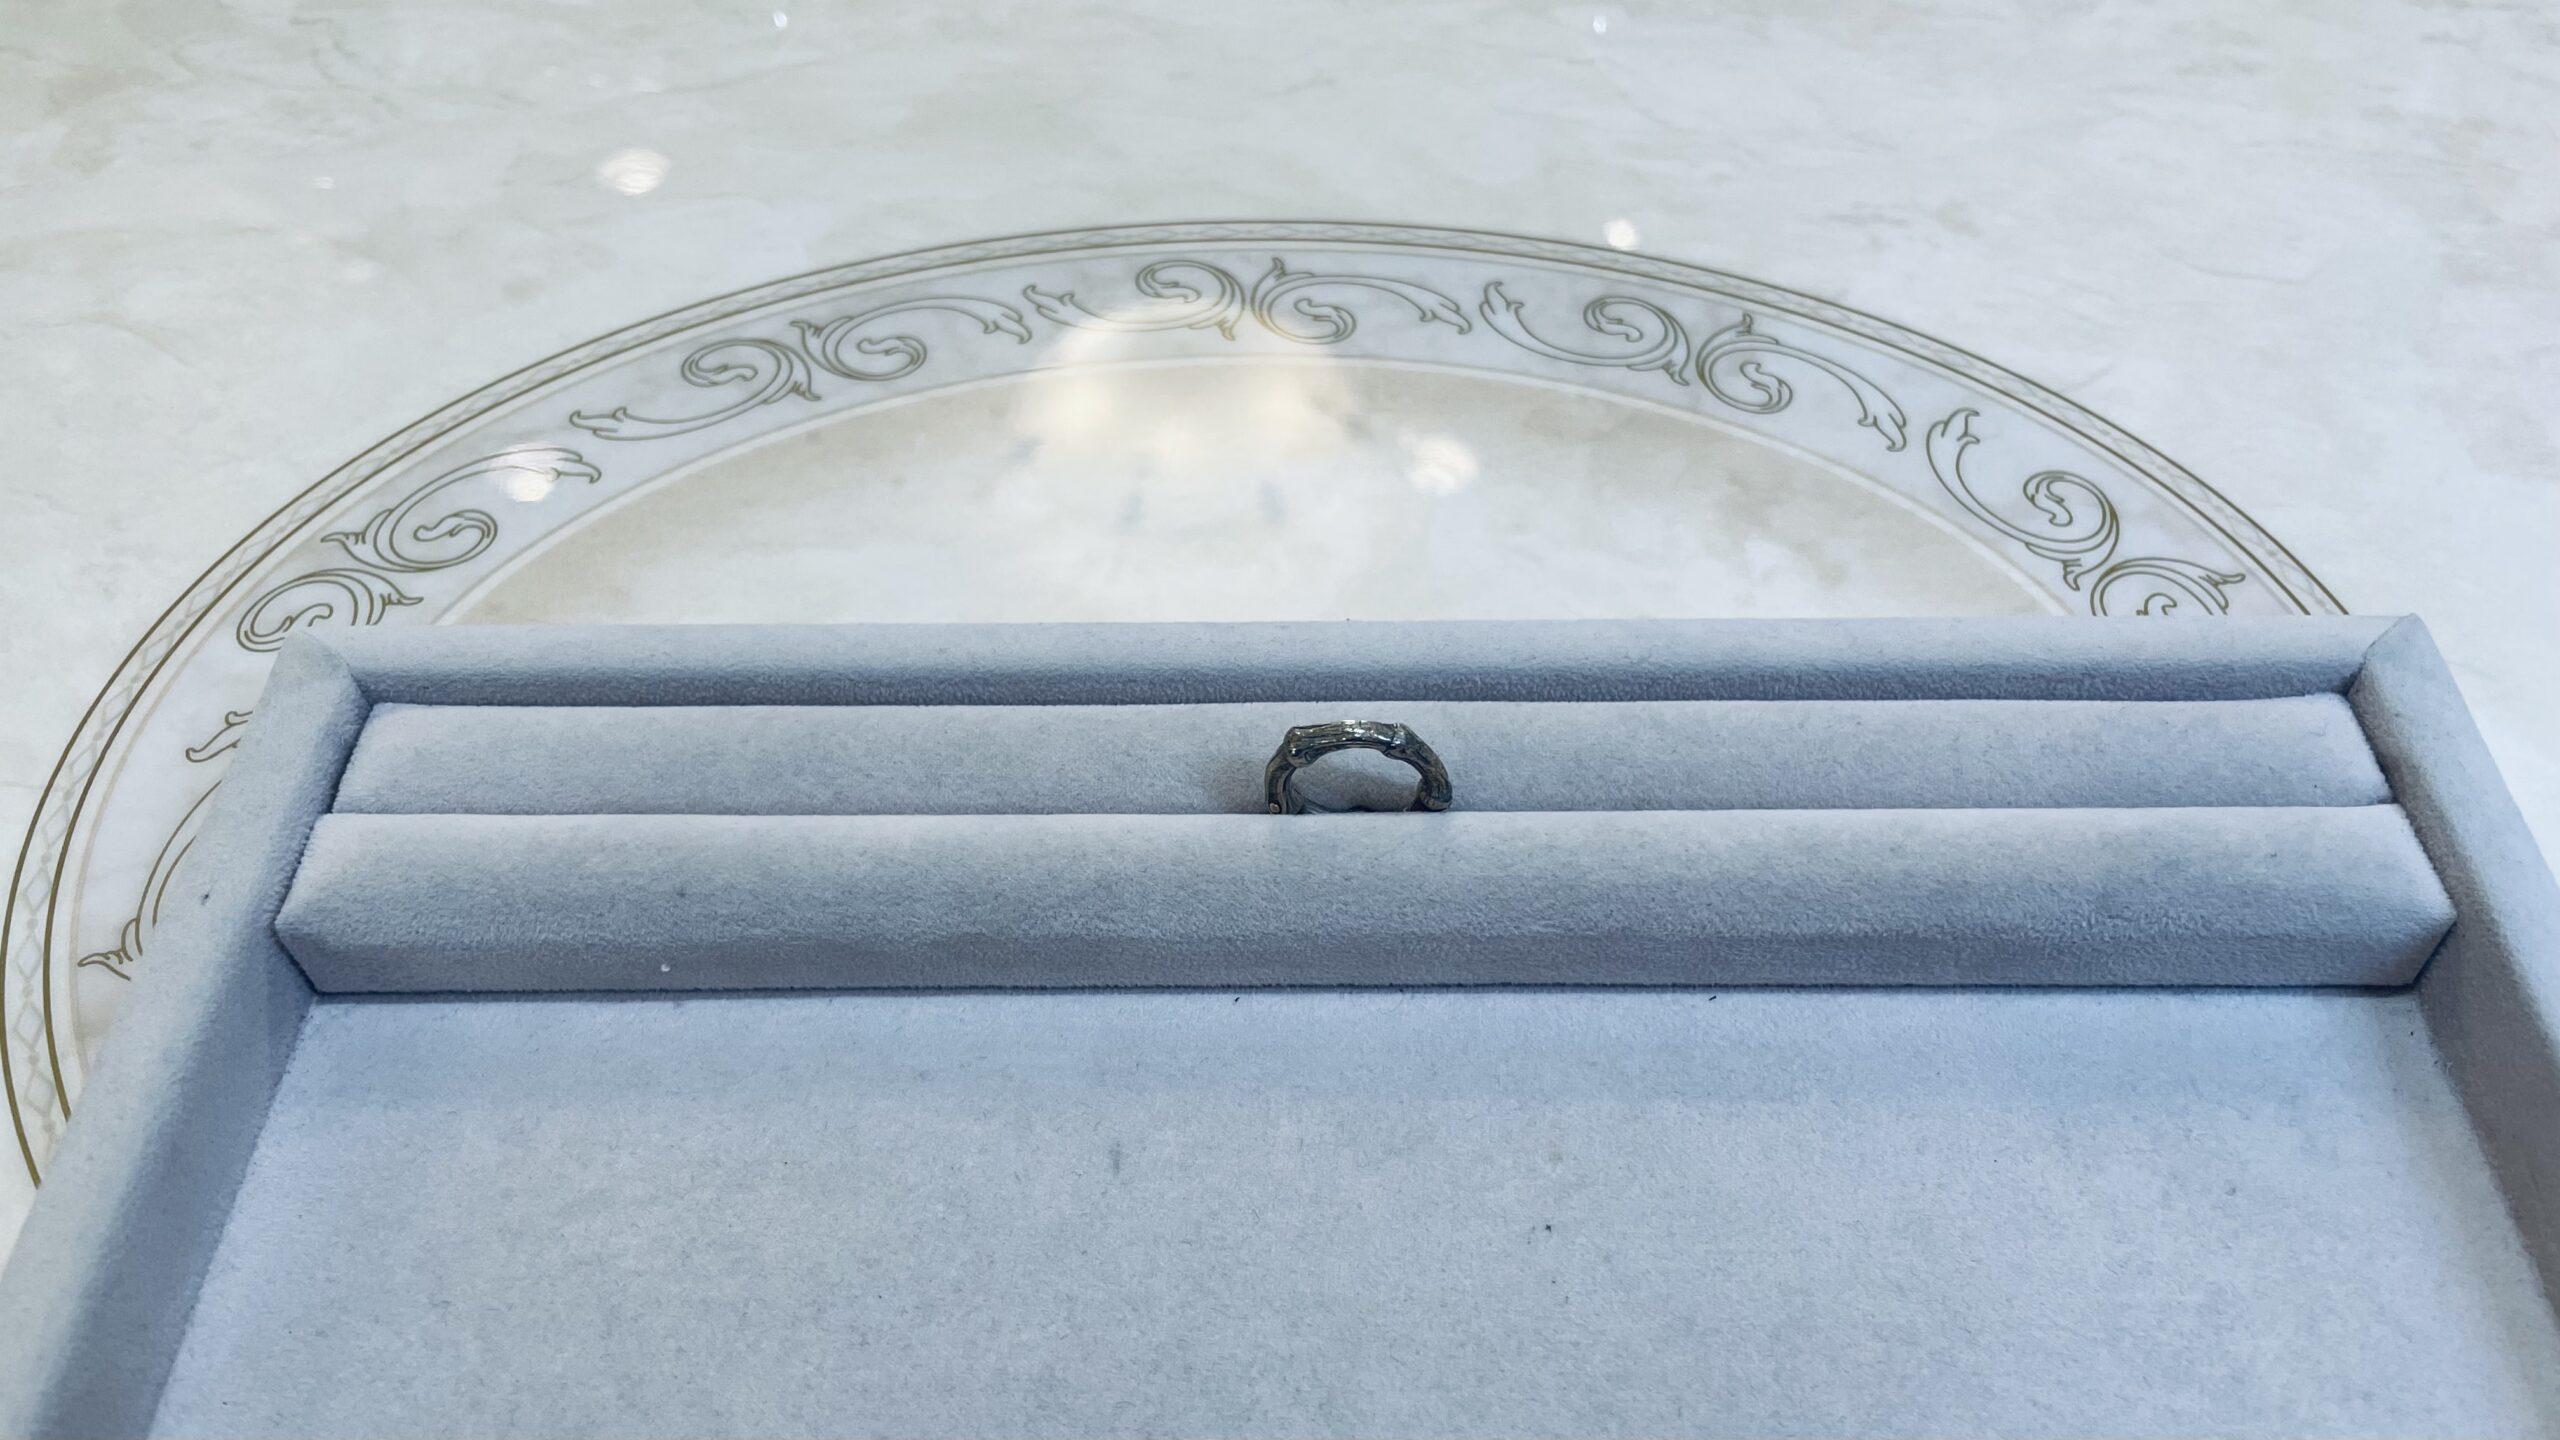 【買取速報】指輪、SV925、Tiffany & Co.-2021-02-07